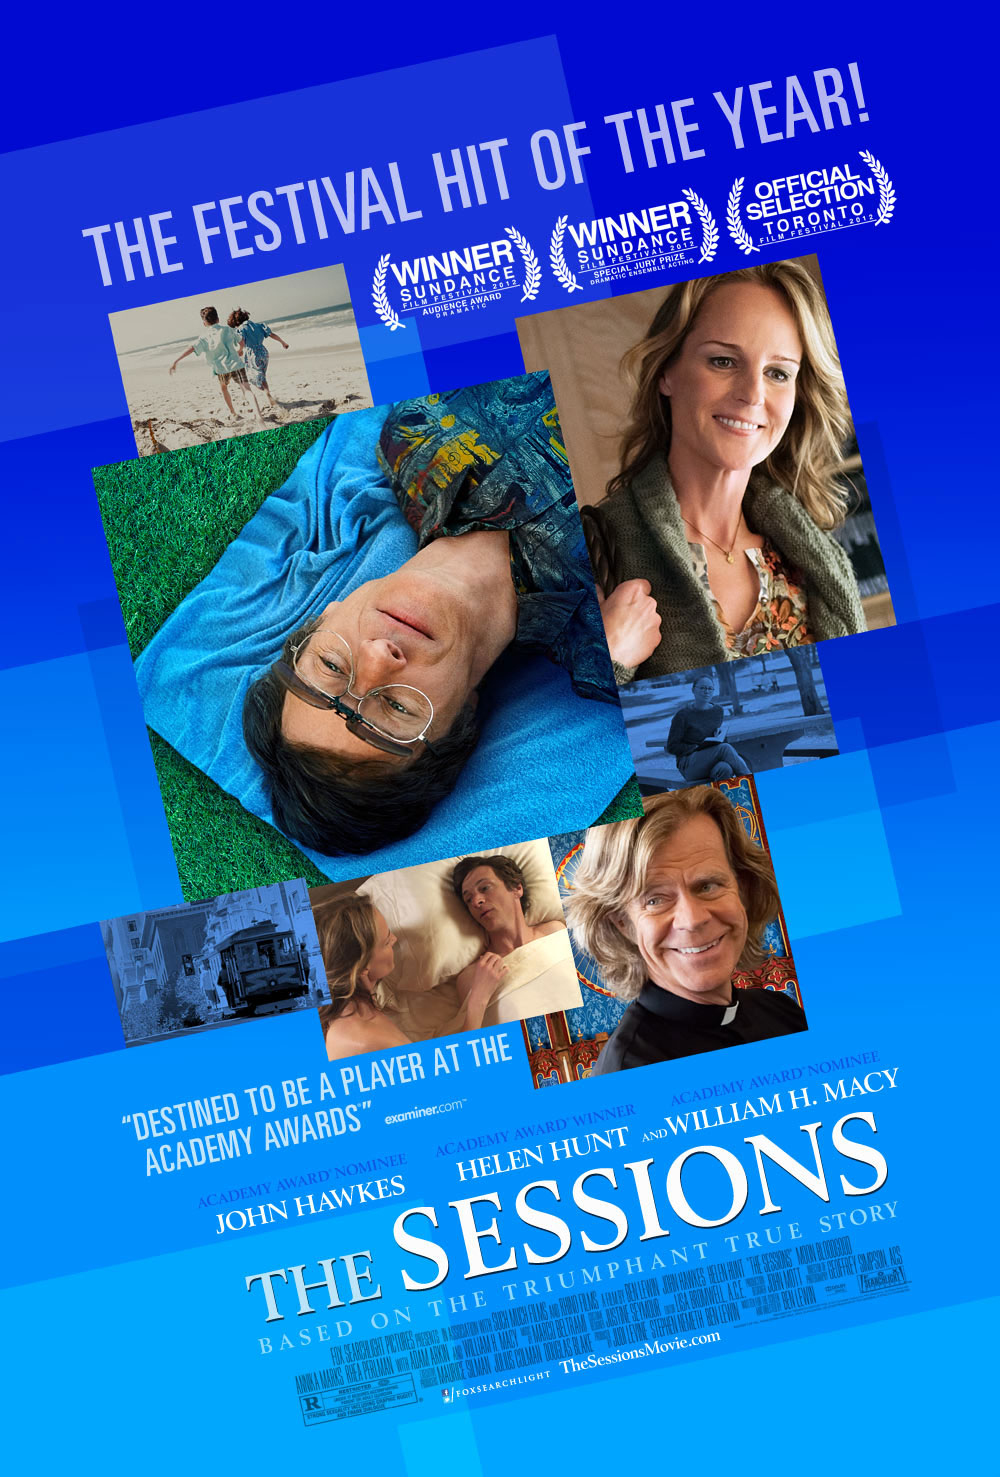 Fox studios movie session times